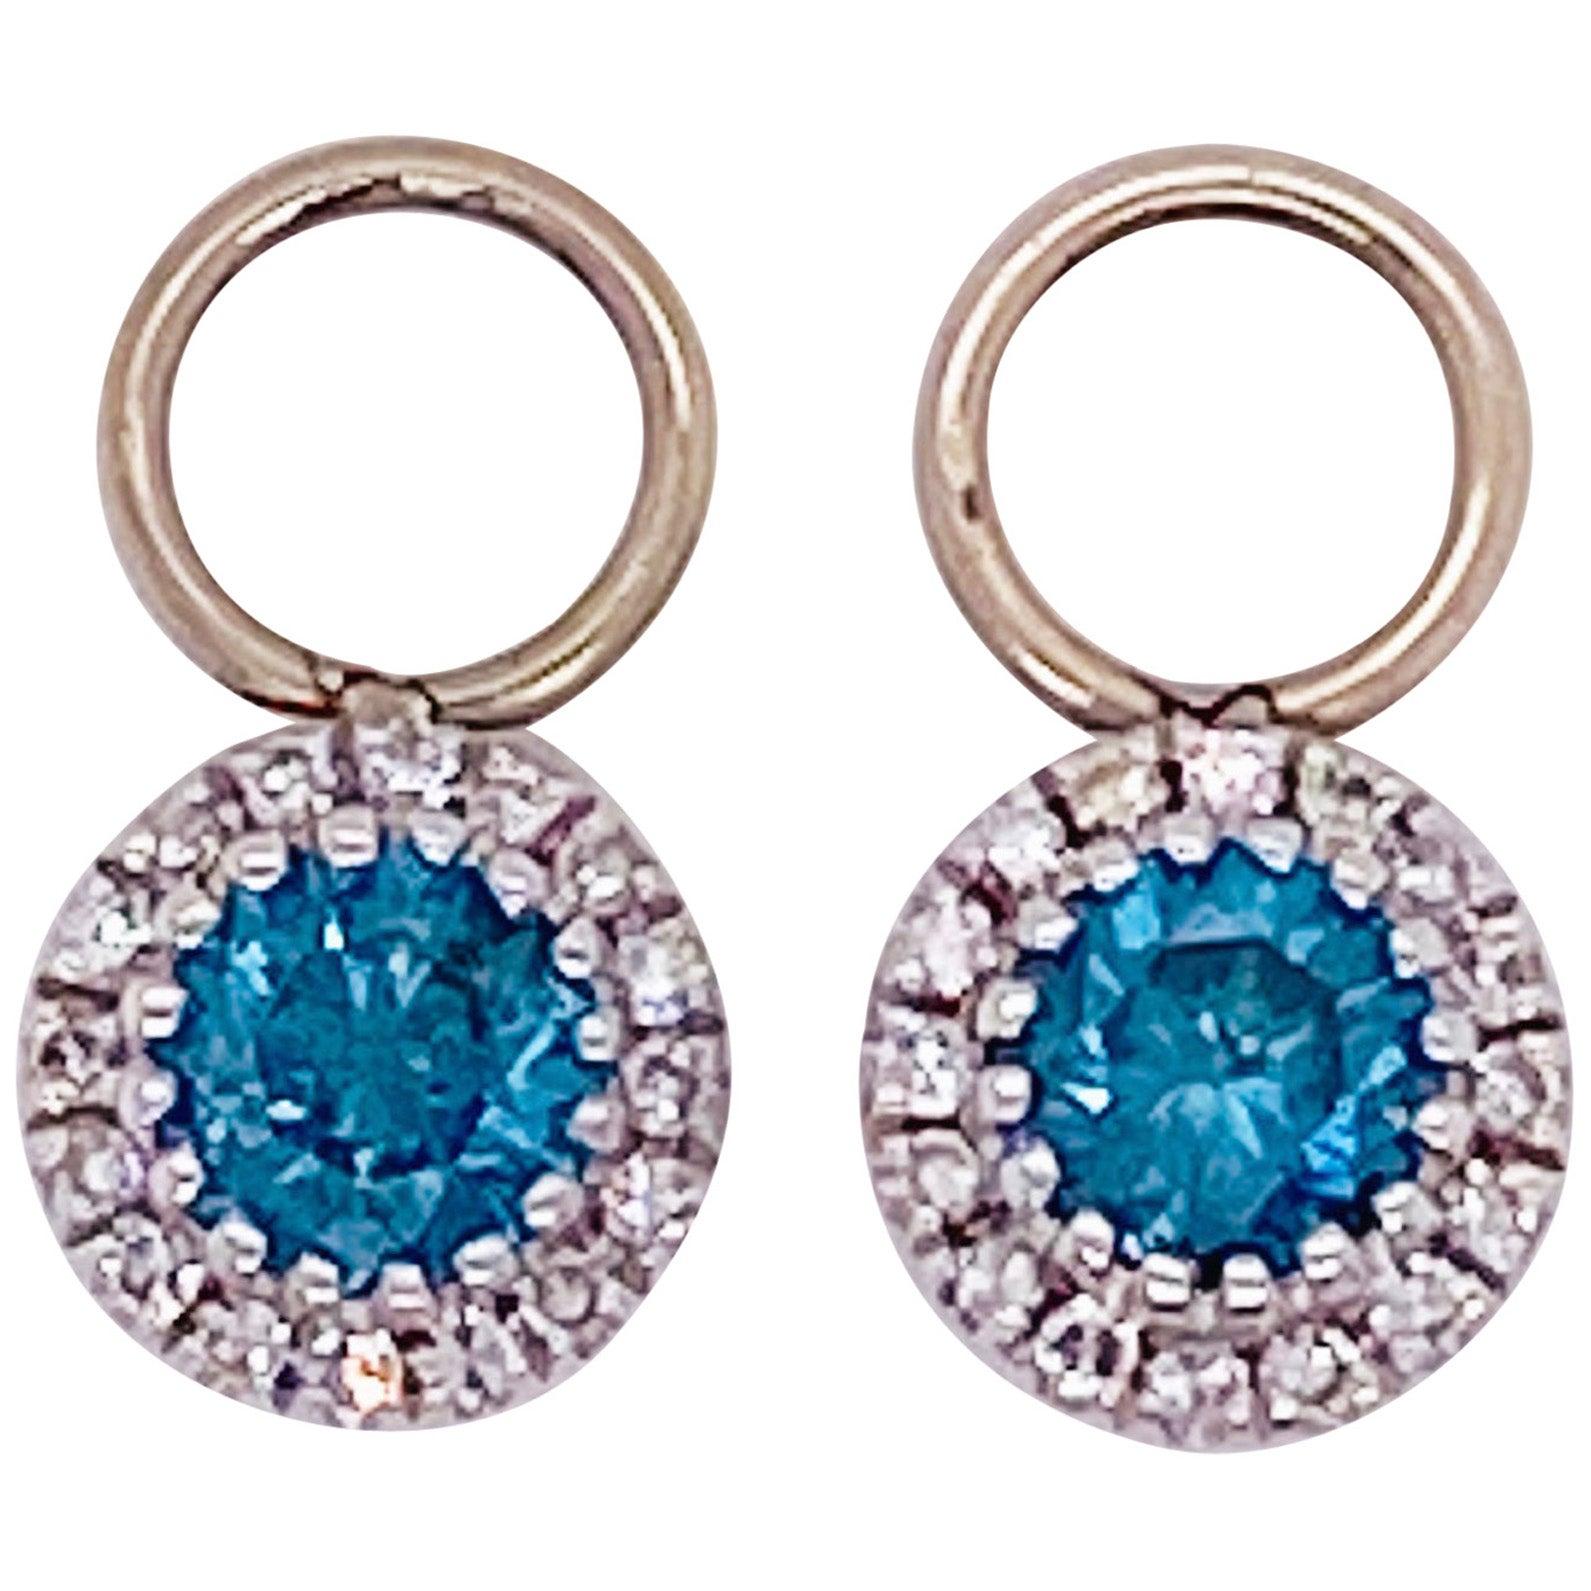 Topaz Diamond Earring Charms, Blue Topaz, 14 Karat Gold, Hoop Charm, .79 Carat